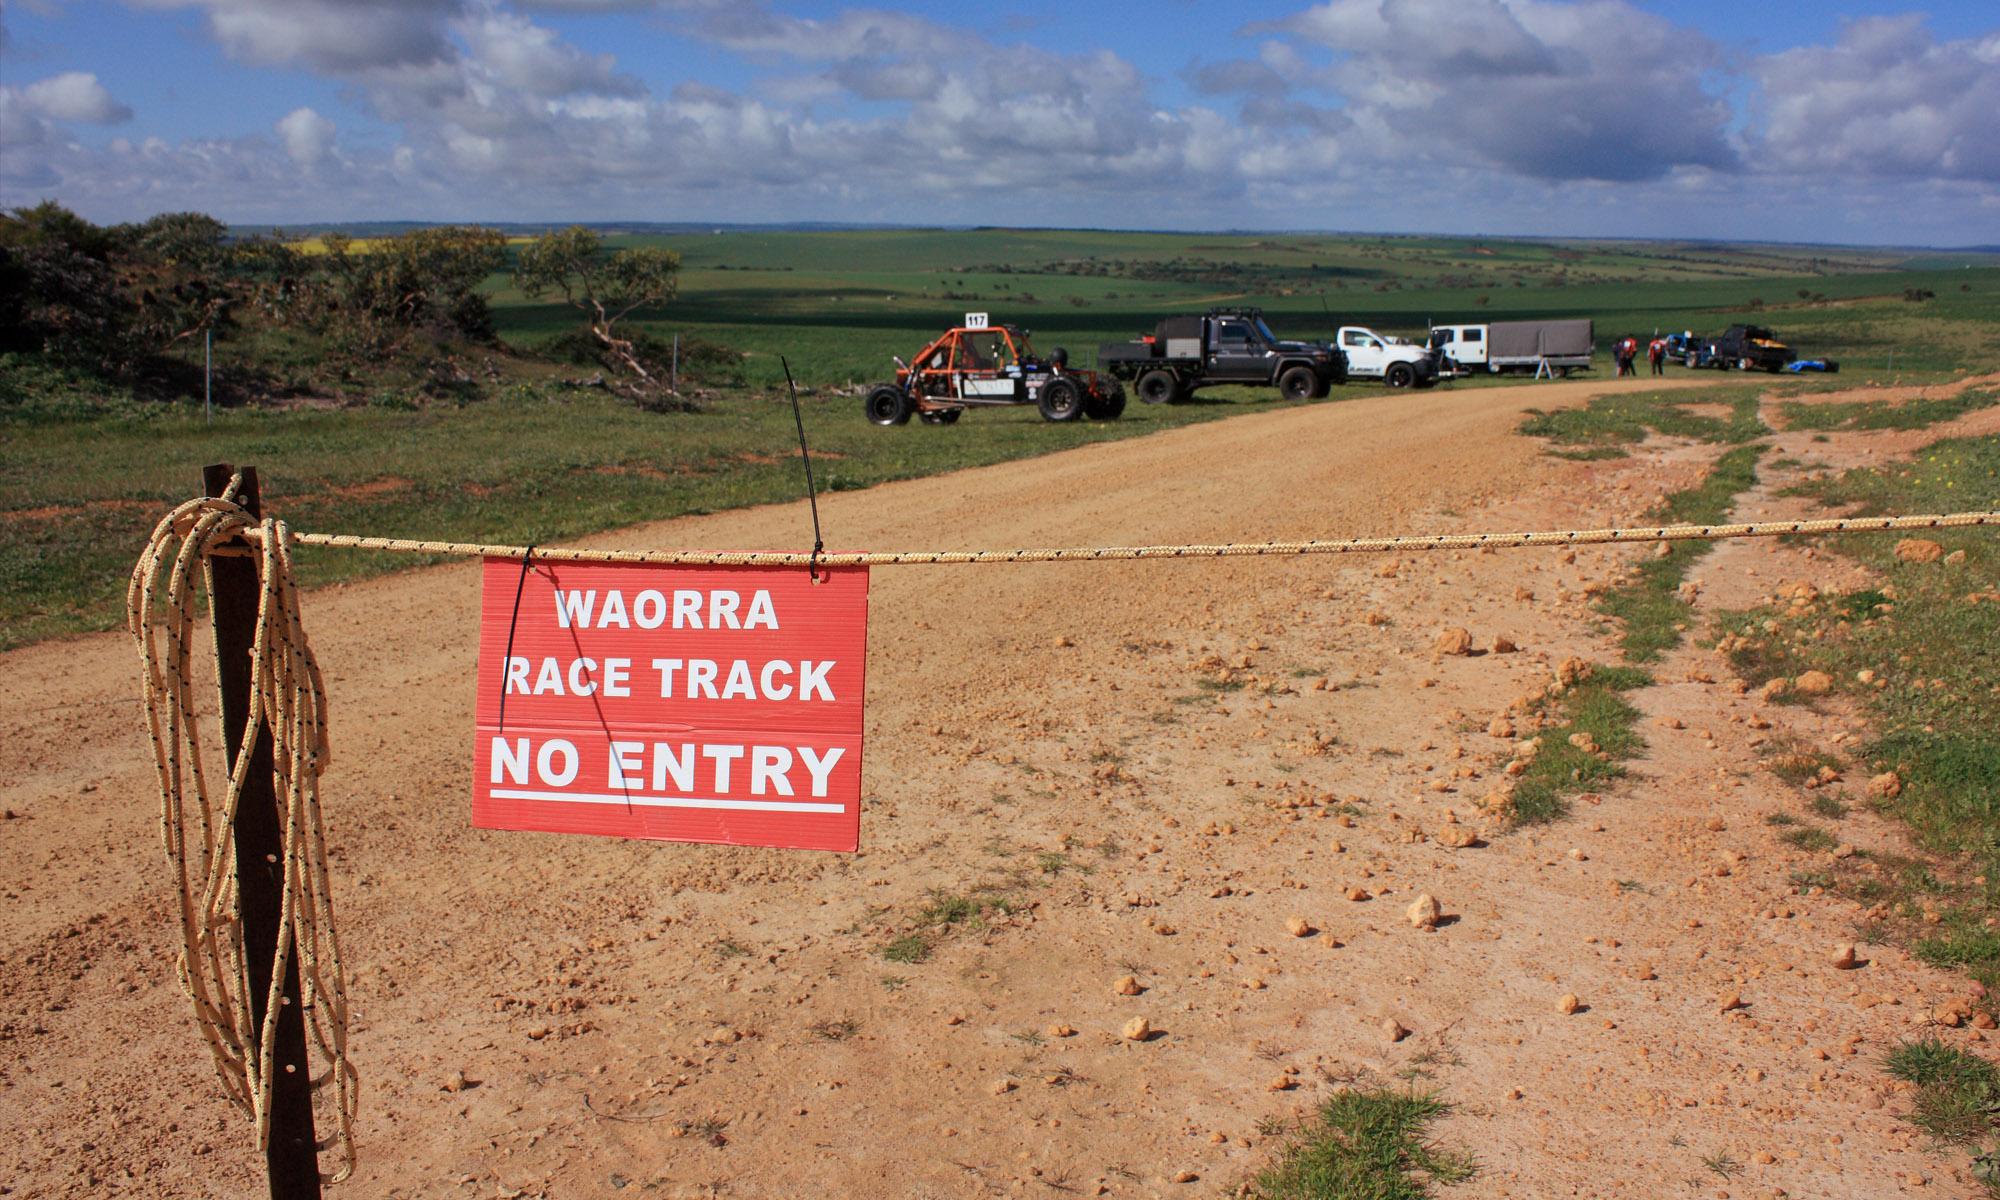 WAORRA Race Track - No Entry